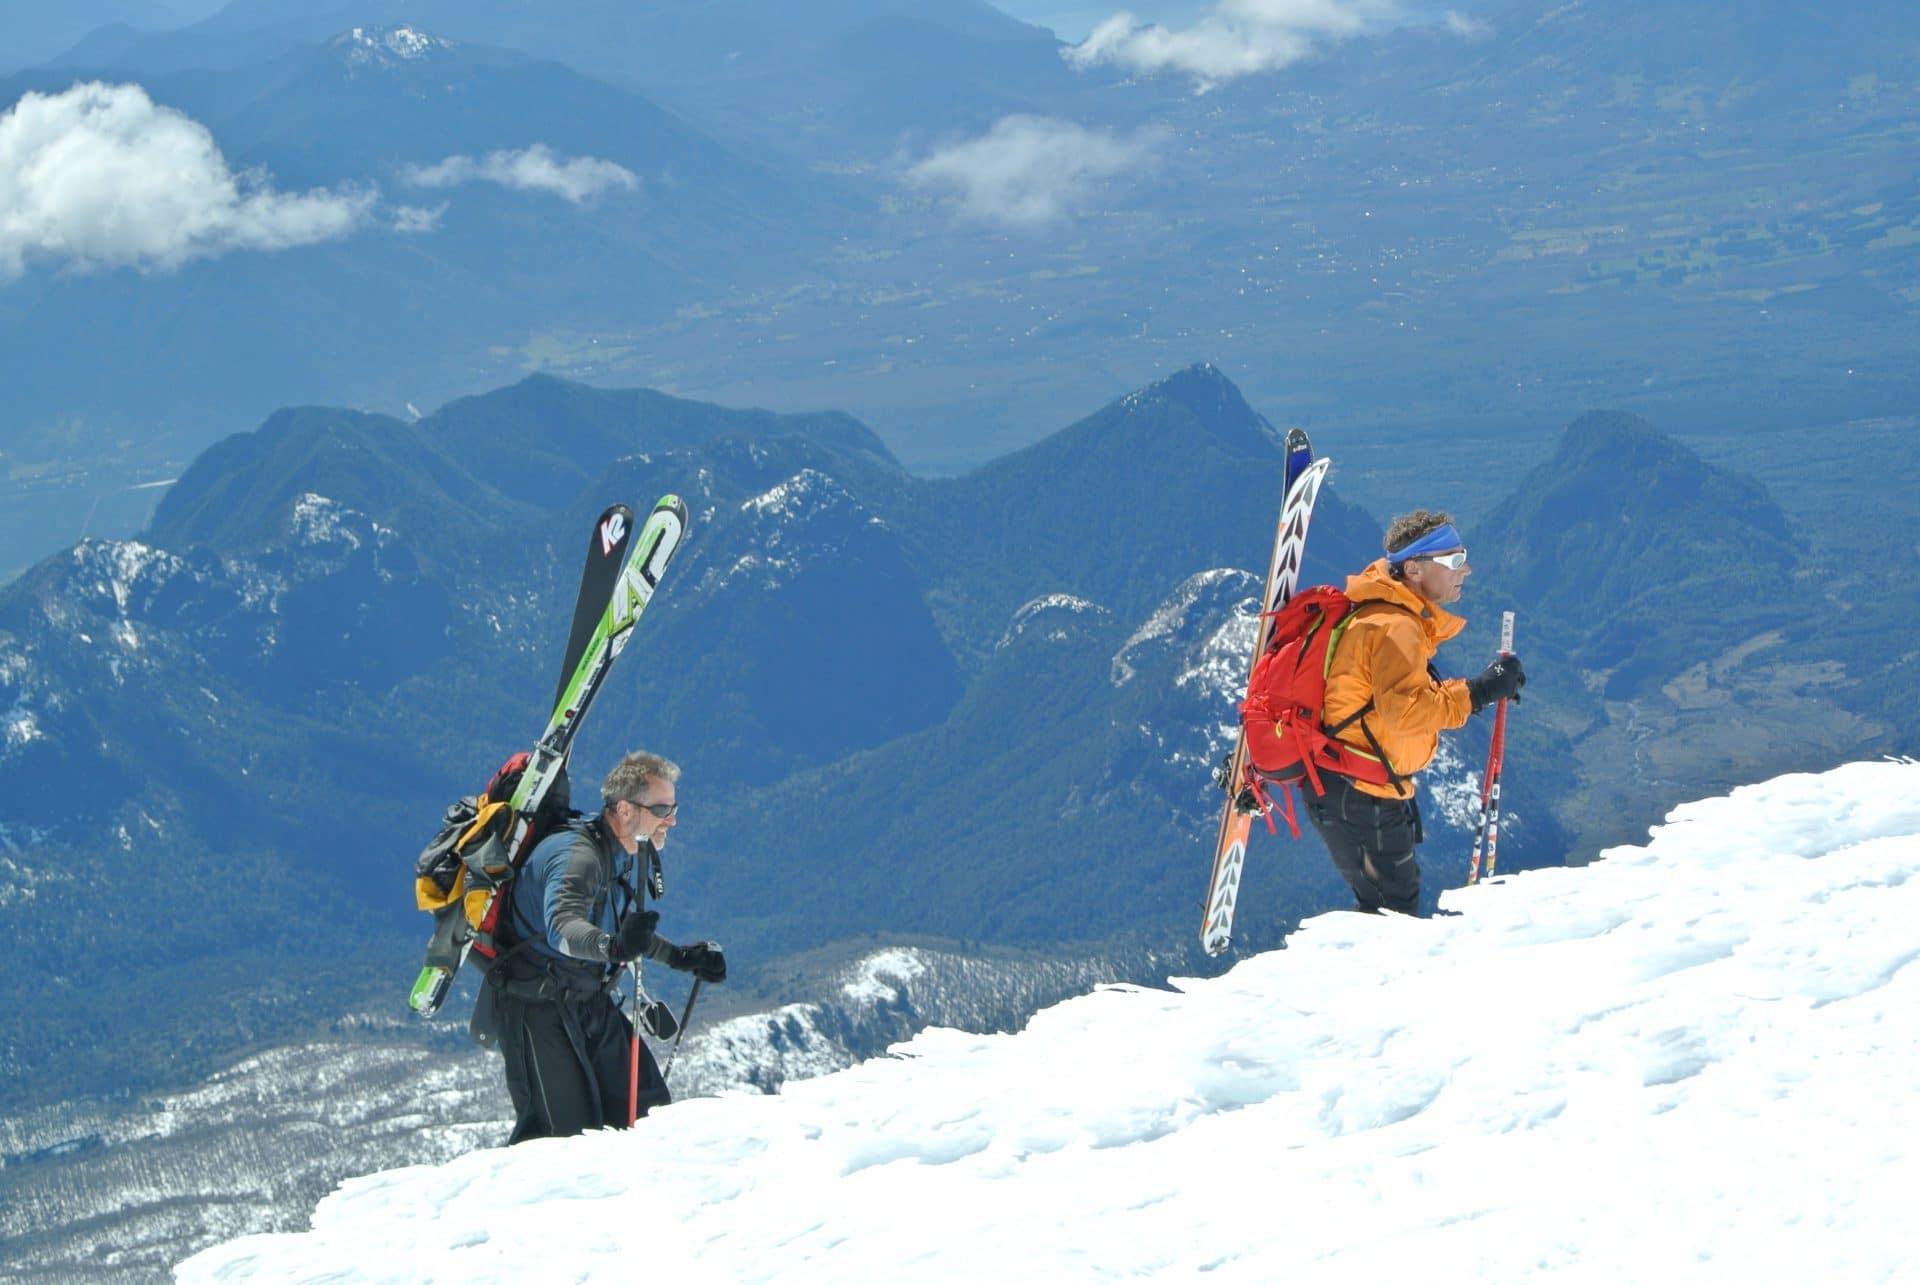 Helyum_Xavier-Carrard_Guide-de-montagne_Ski_Voyage_Argentine_Chili_Volcan-Lonquimay_arête-sommitale